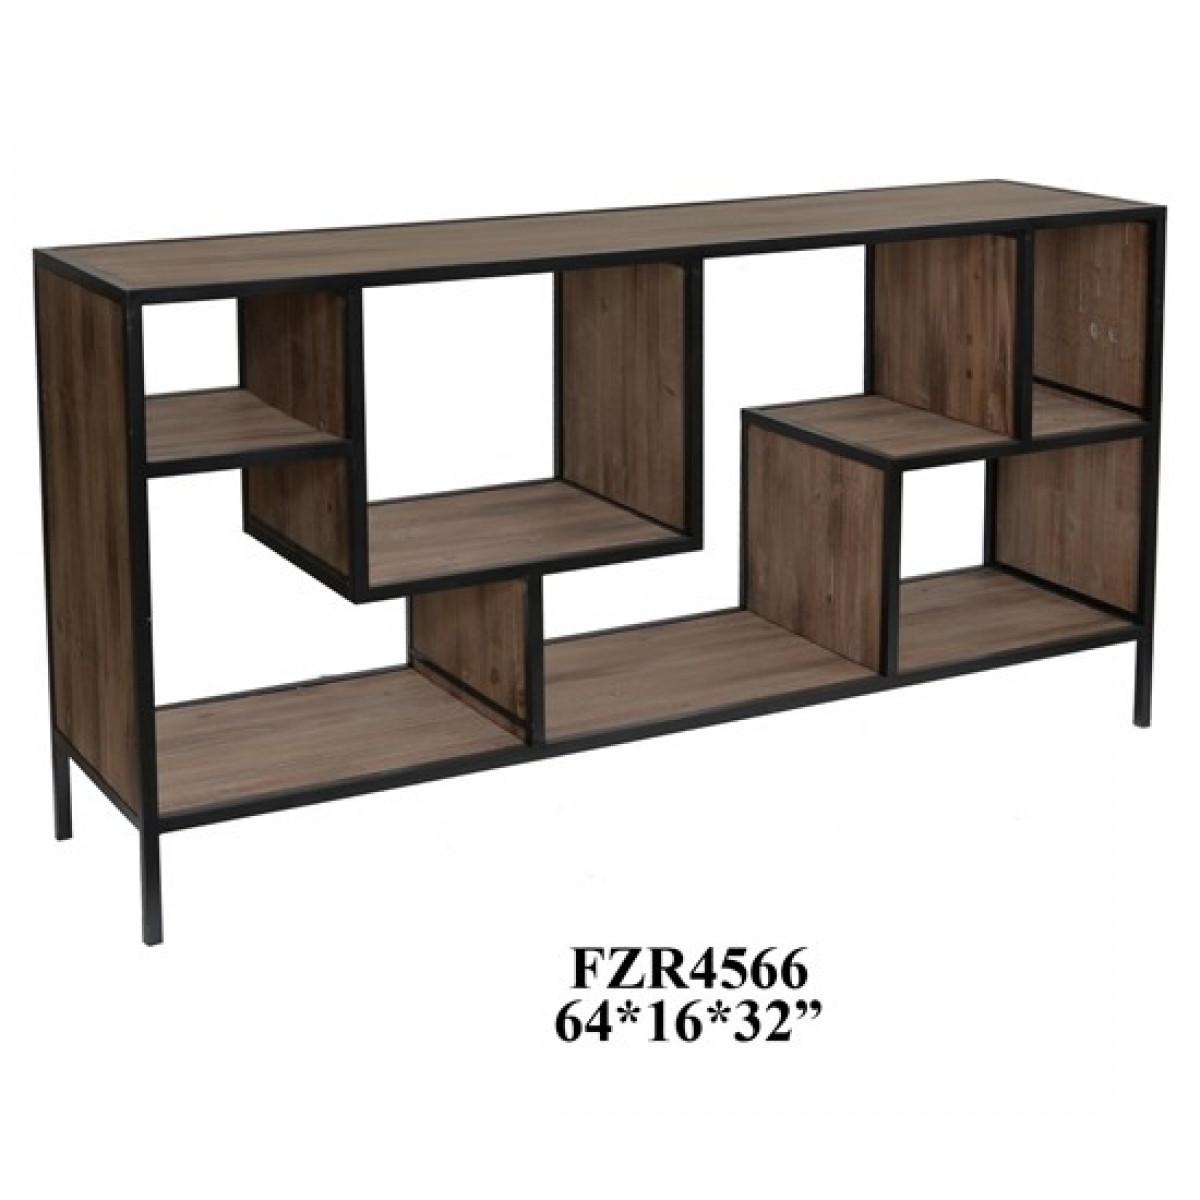 "Console, Modern Geometric Angled Wood with Metal Trim, 64"""